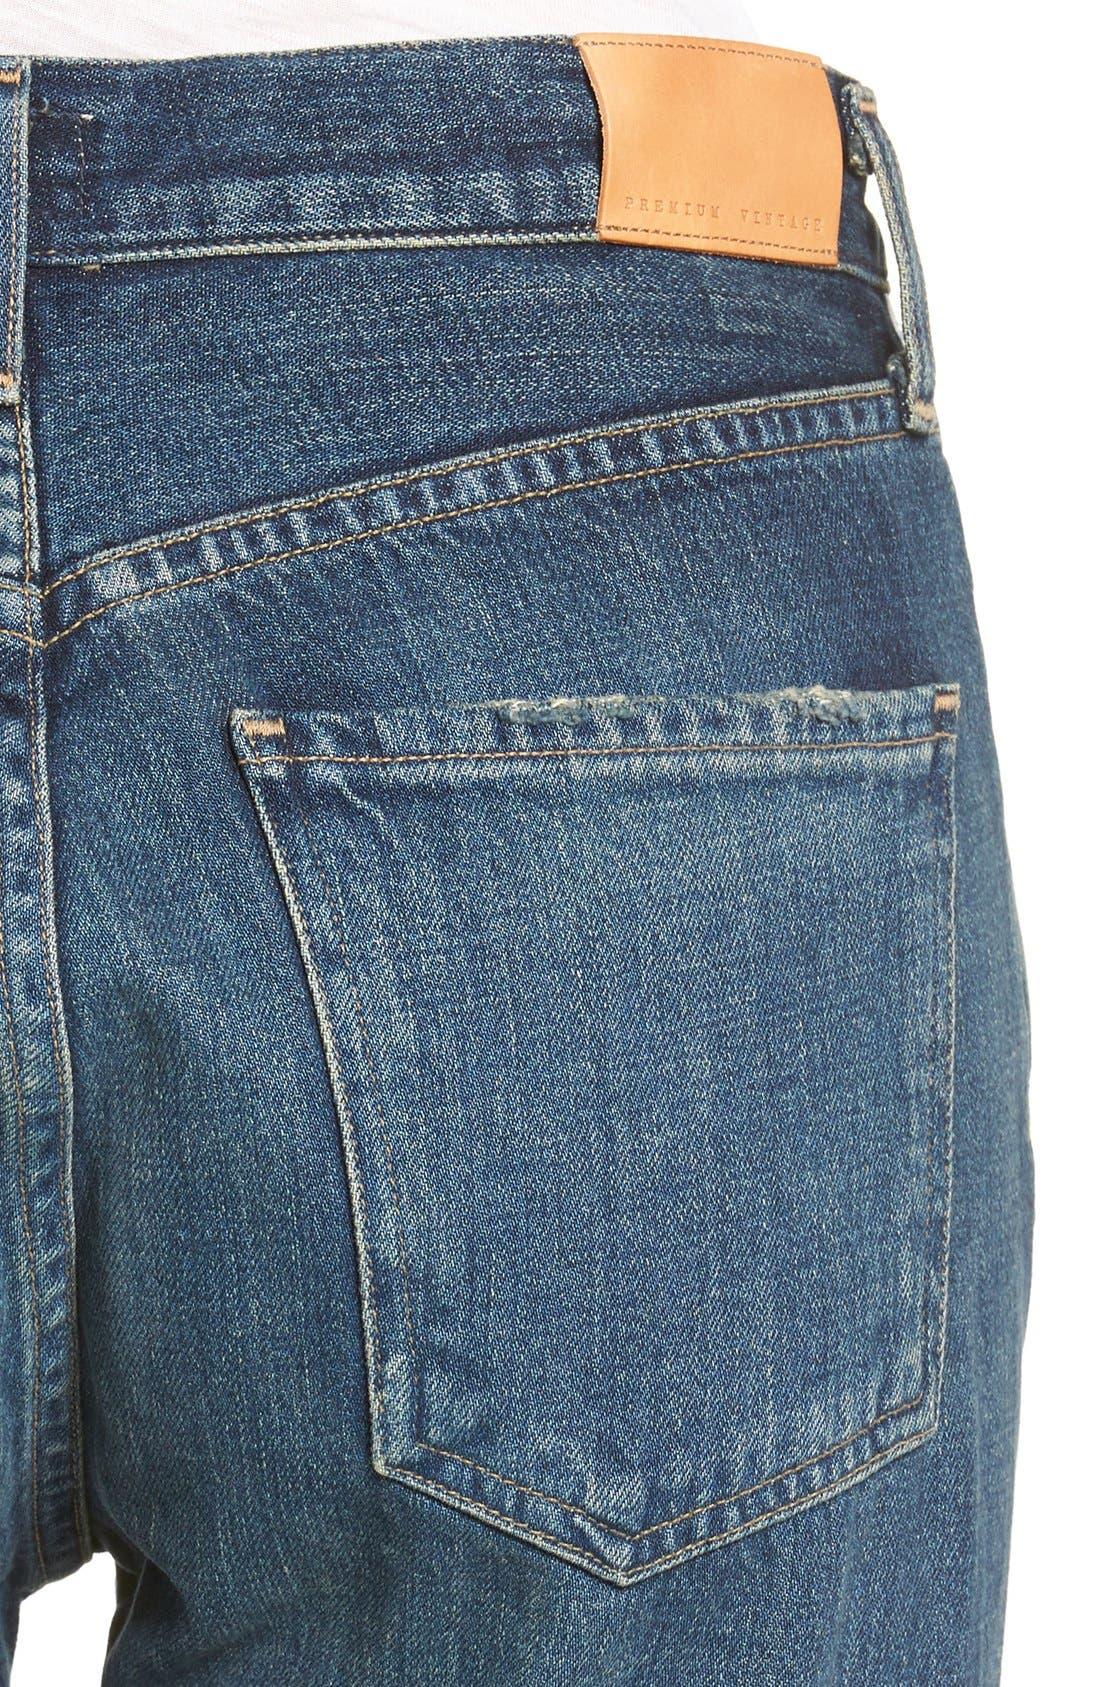 Liya High Waist Slim Boyfriend Jeans,                             Alternate thumbnail 6, color,                             WILTERN